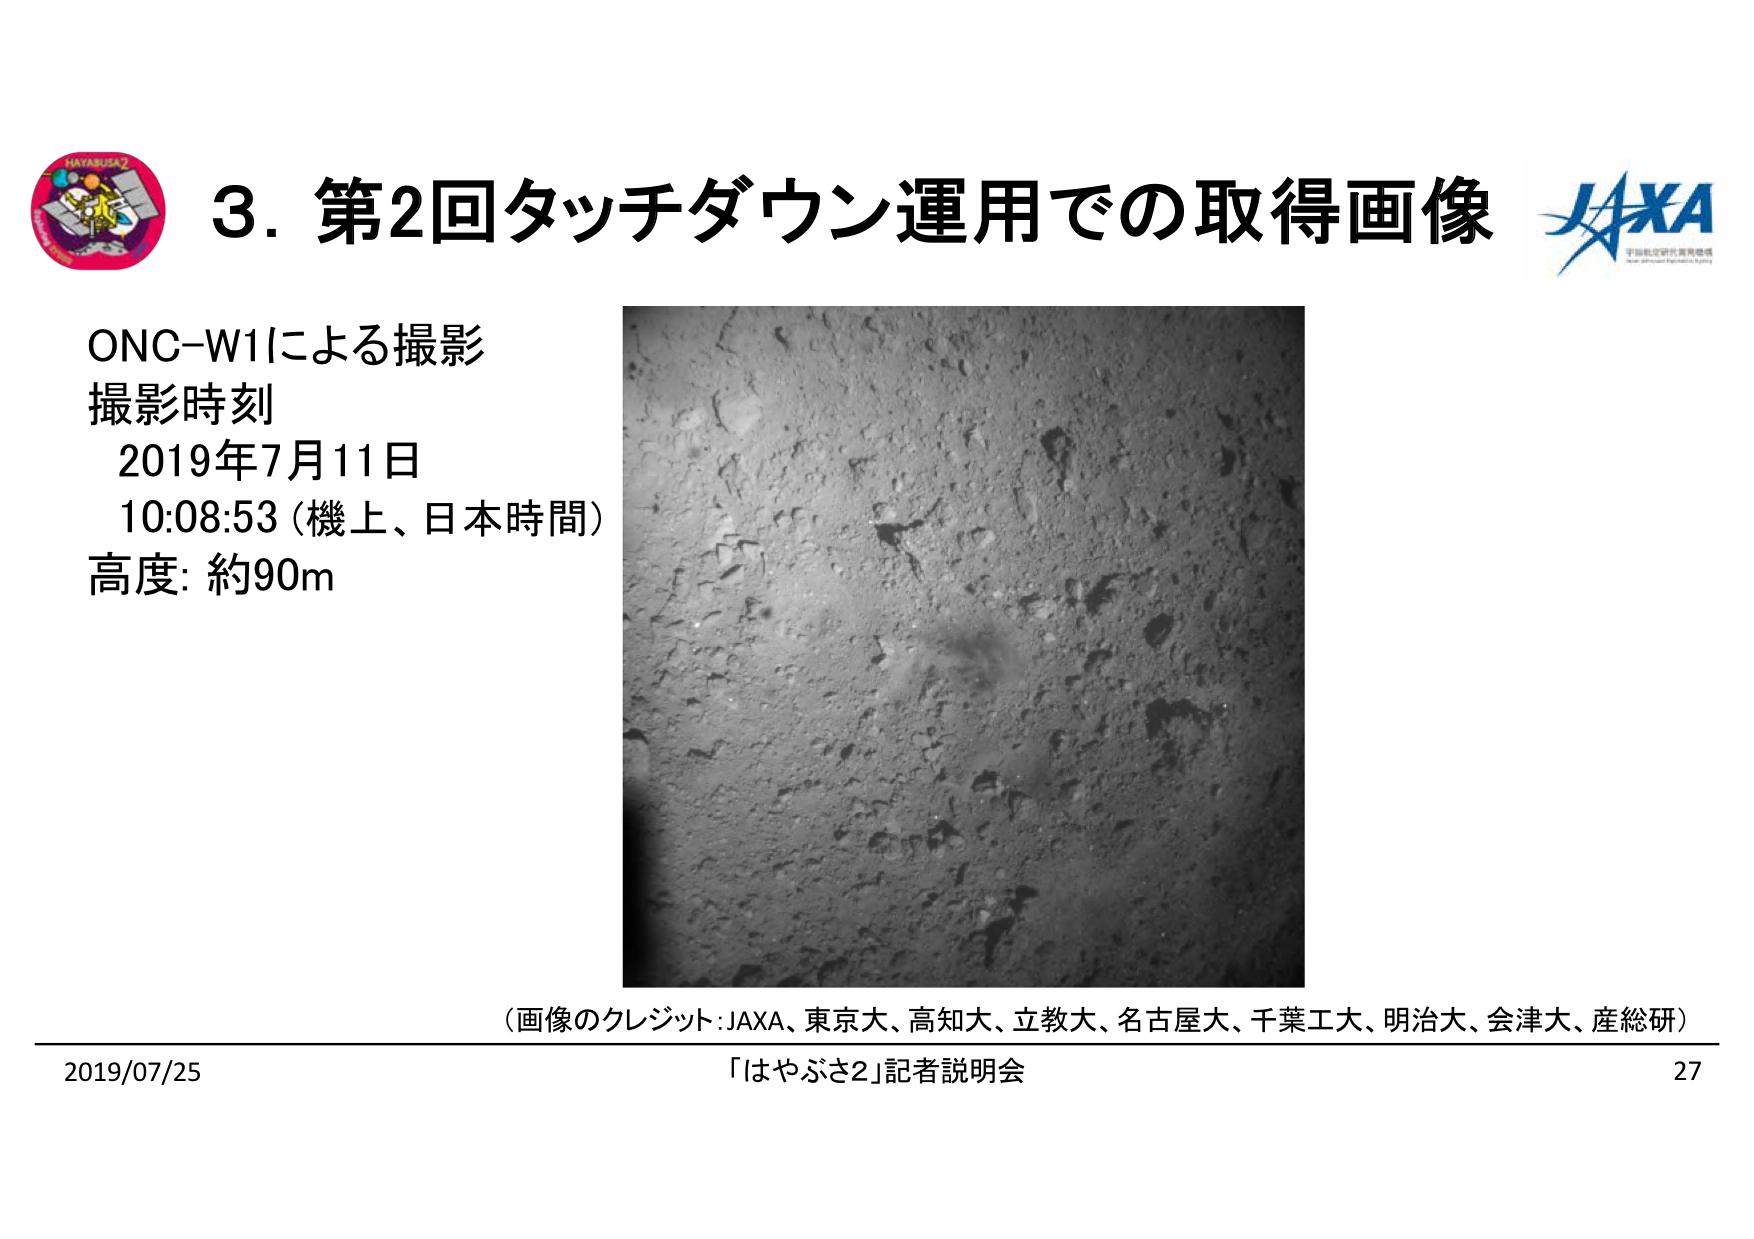 f:id:Imamura:20190725151334p:plain